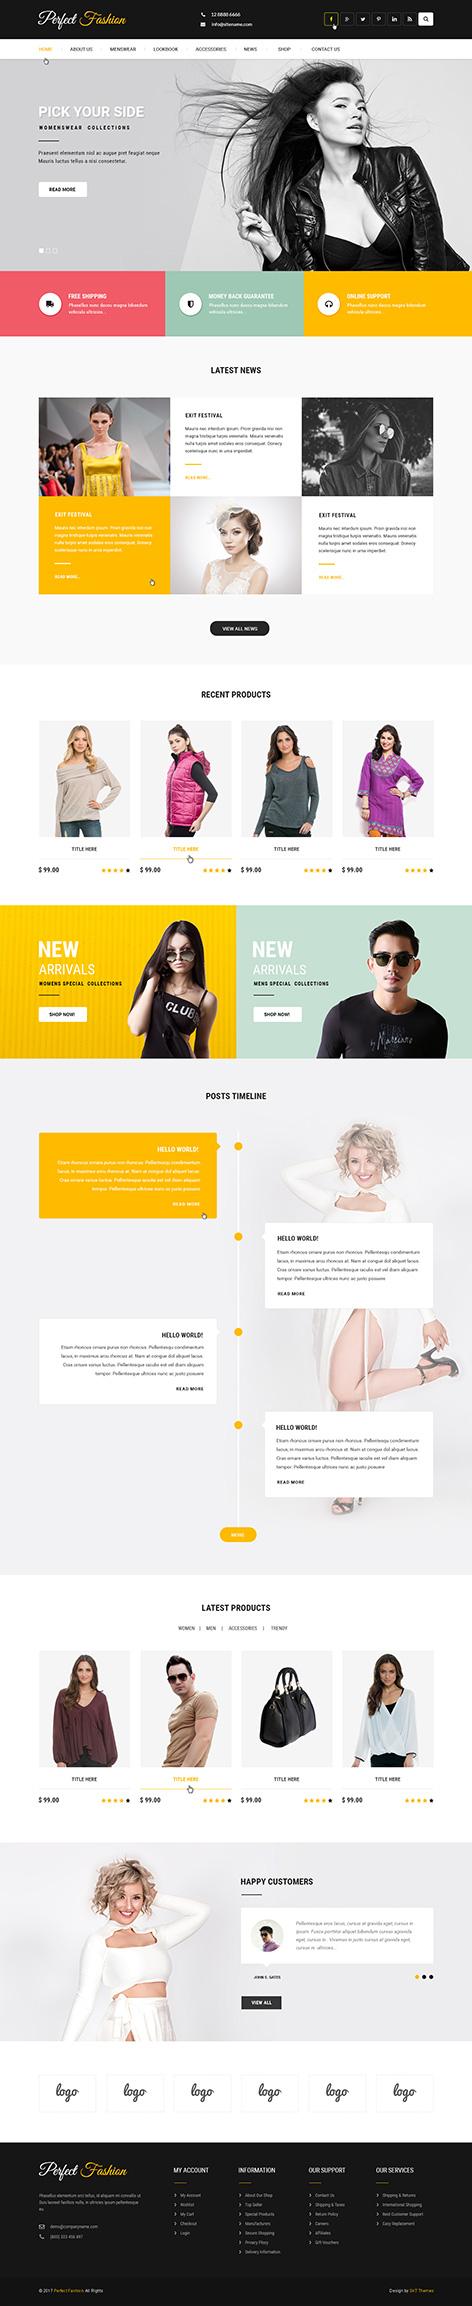 fashion wordpress theme1 - Fashion Trends